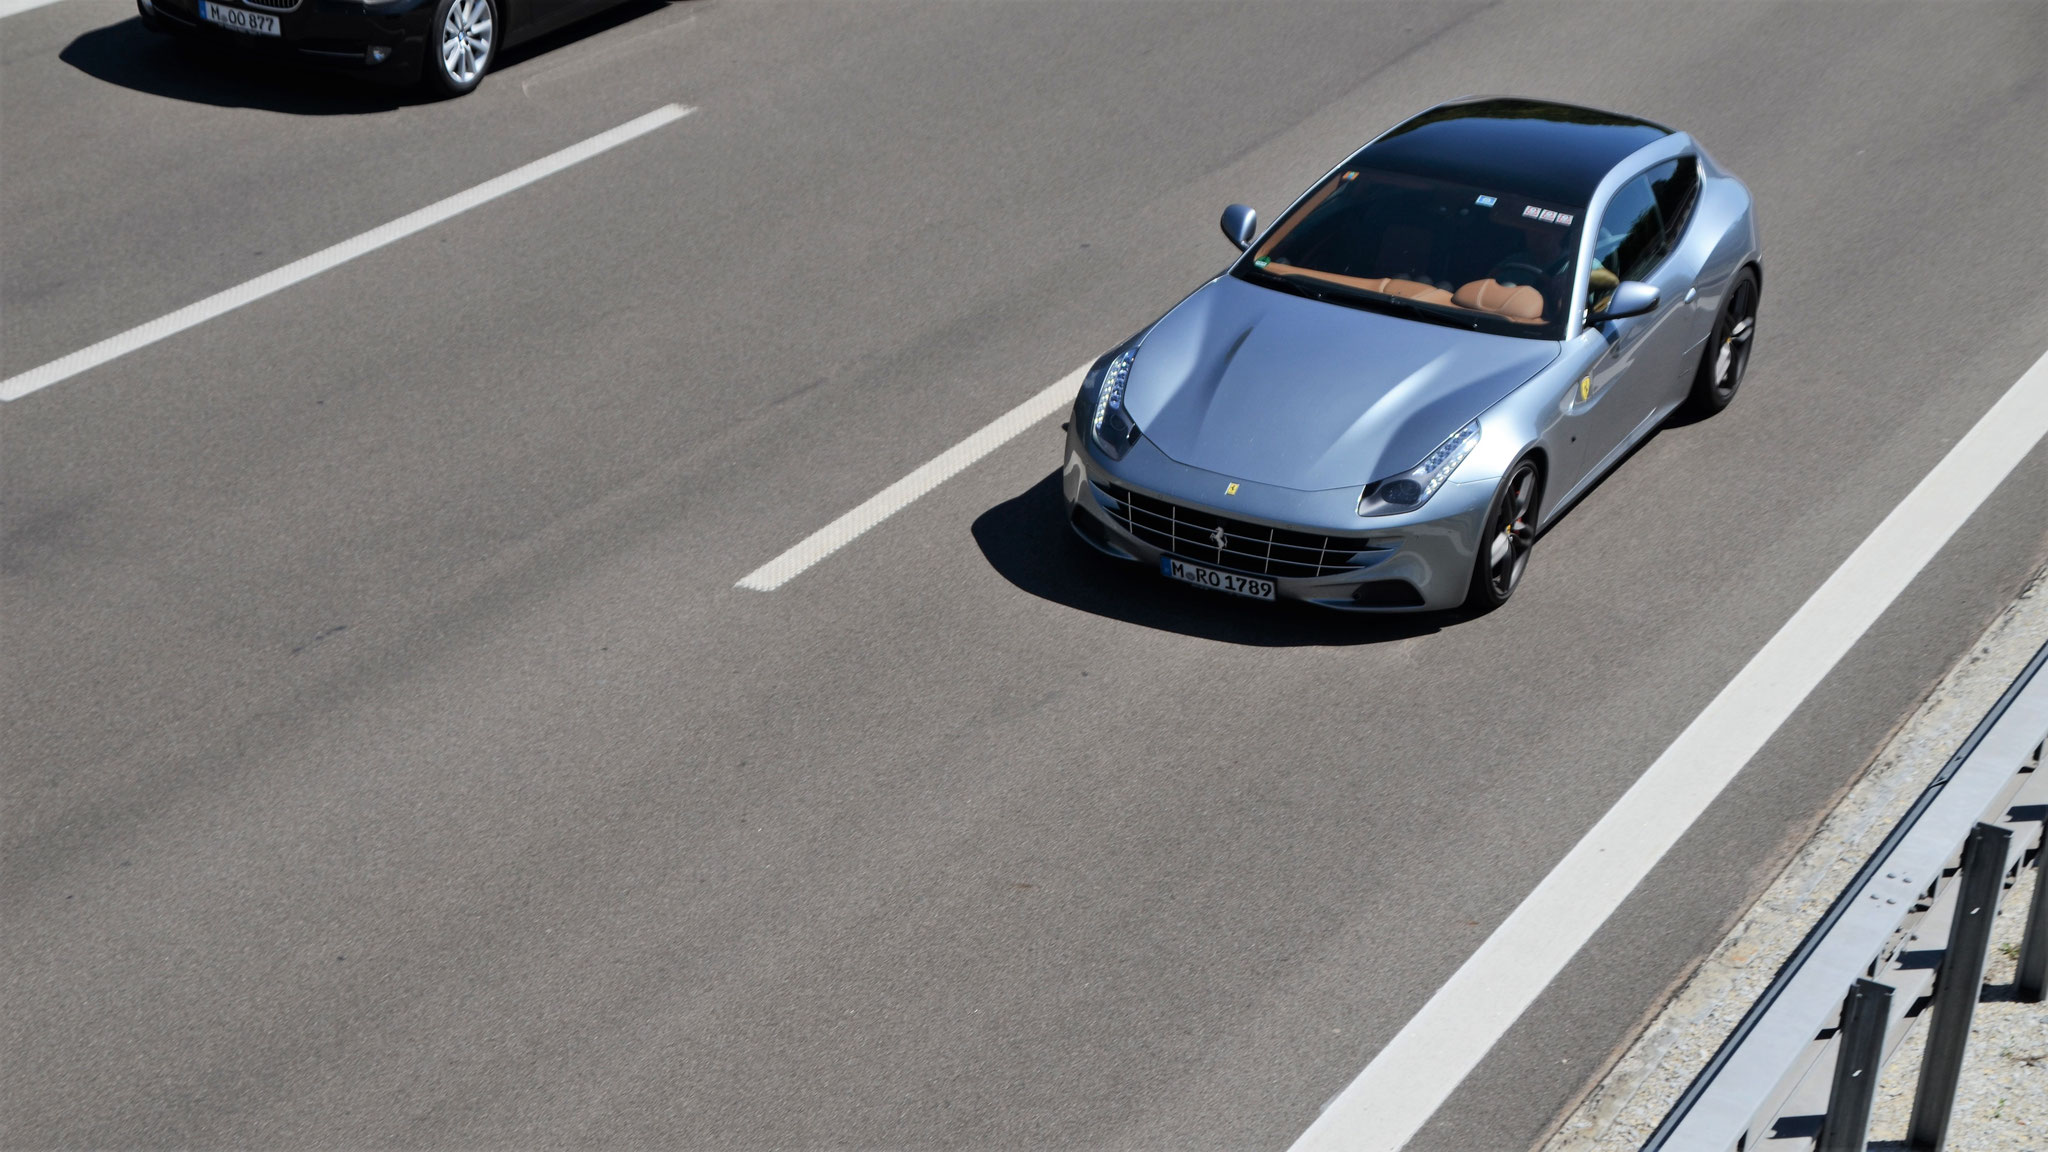 Ferrari FF - M-RO-1789